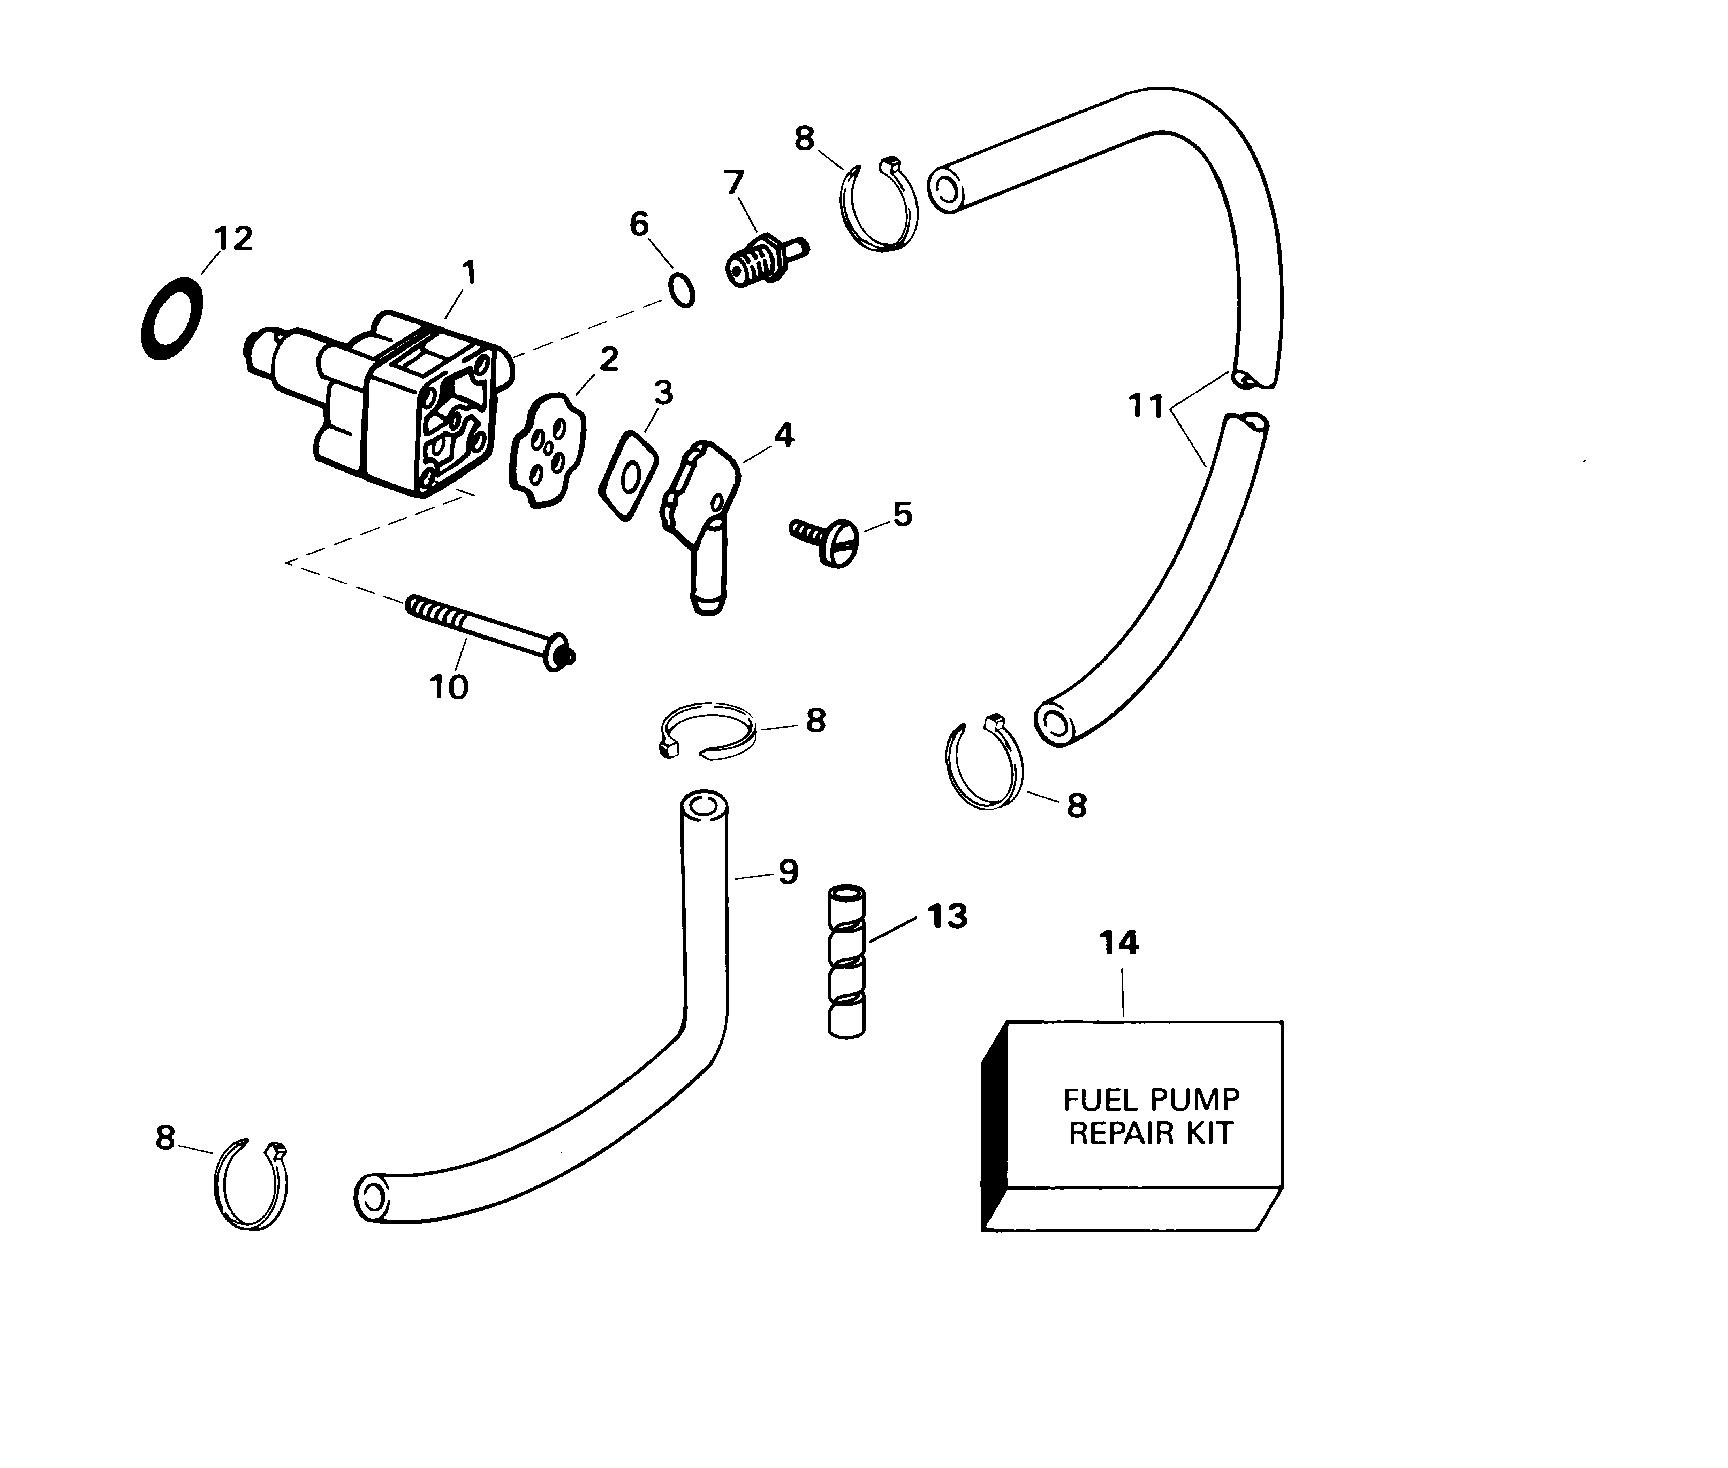 Diagram Of 1975 6r75r Johnson Outboard Fuel Pump Diagram And Parts